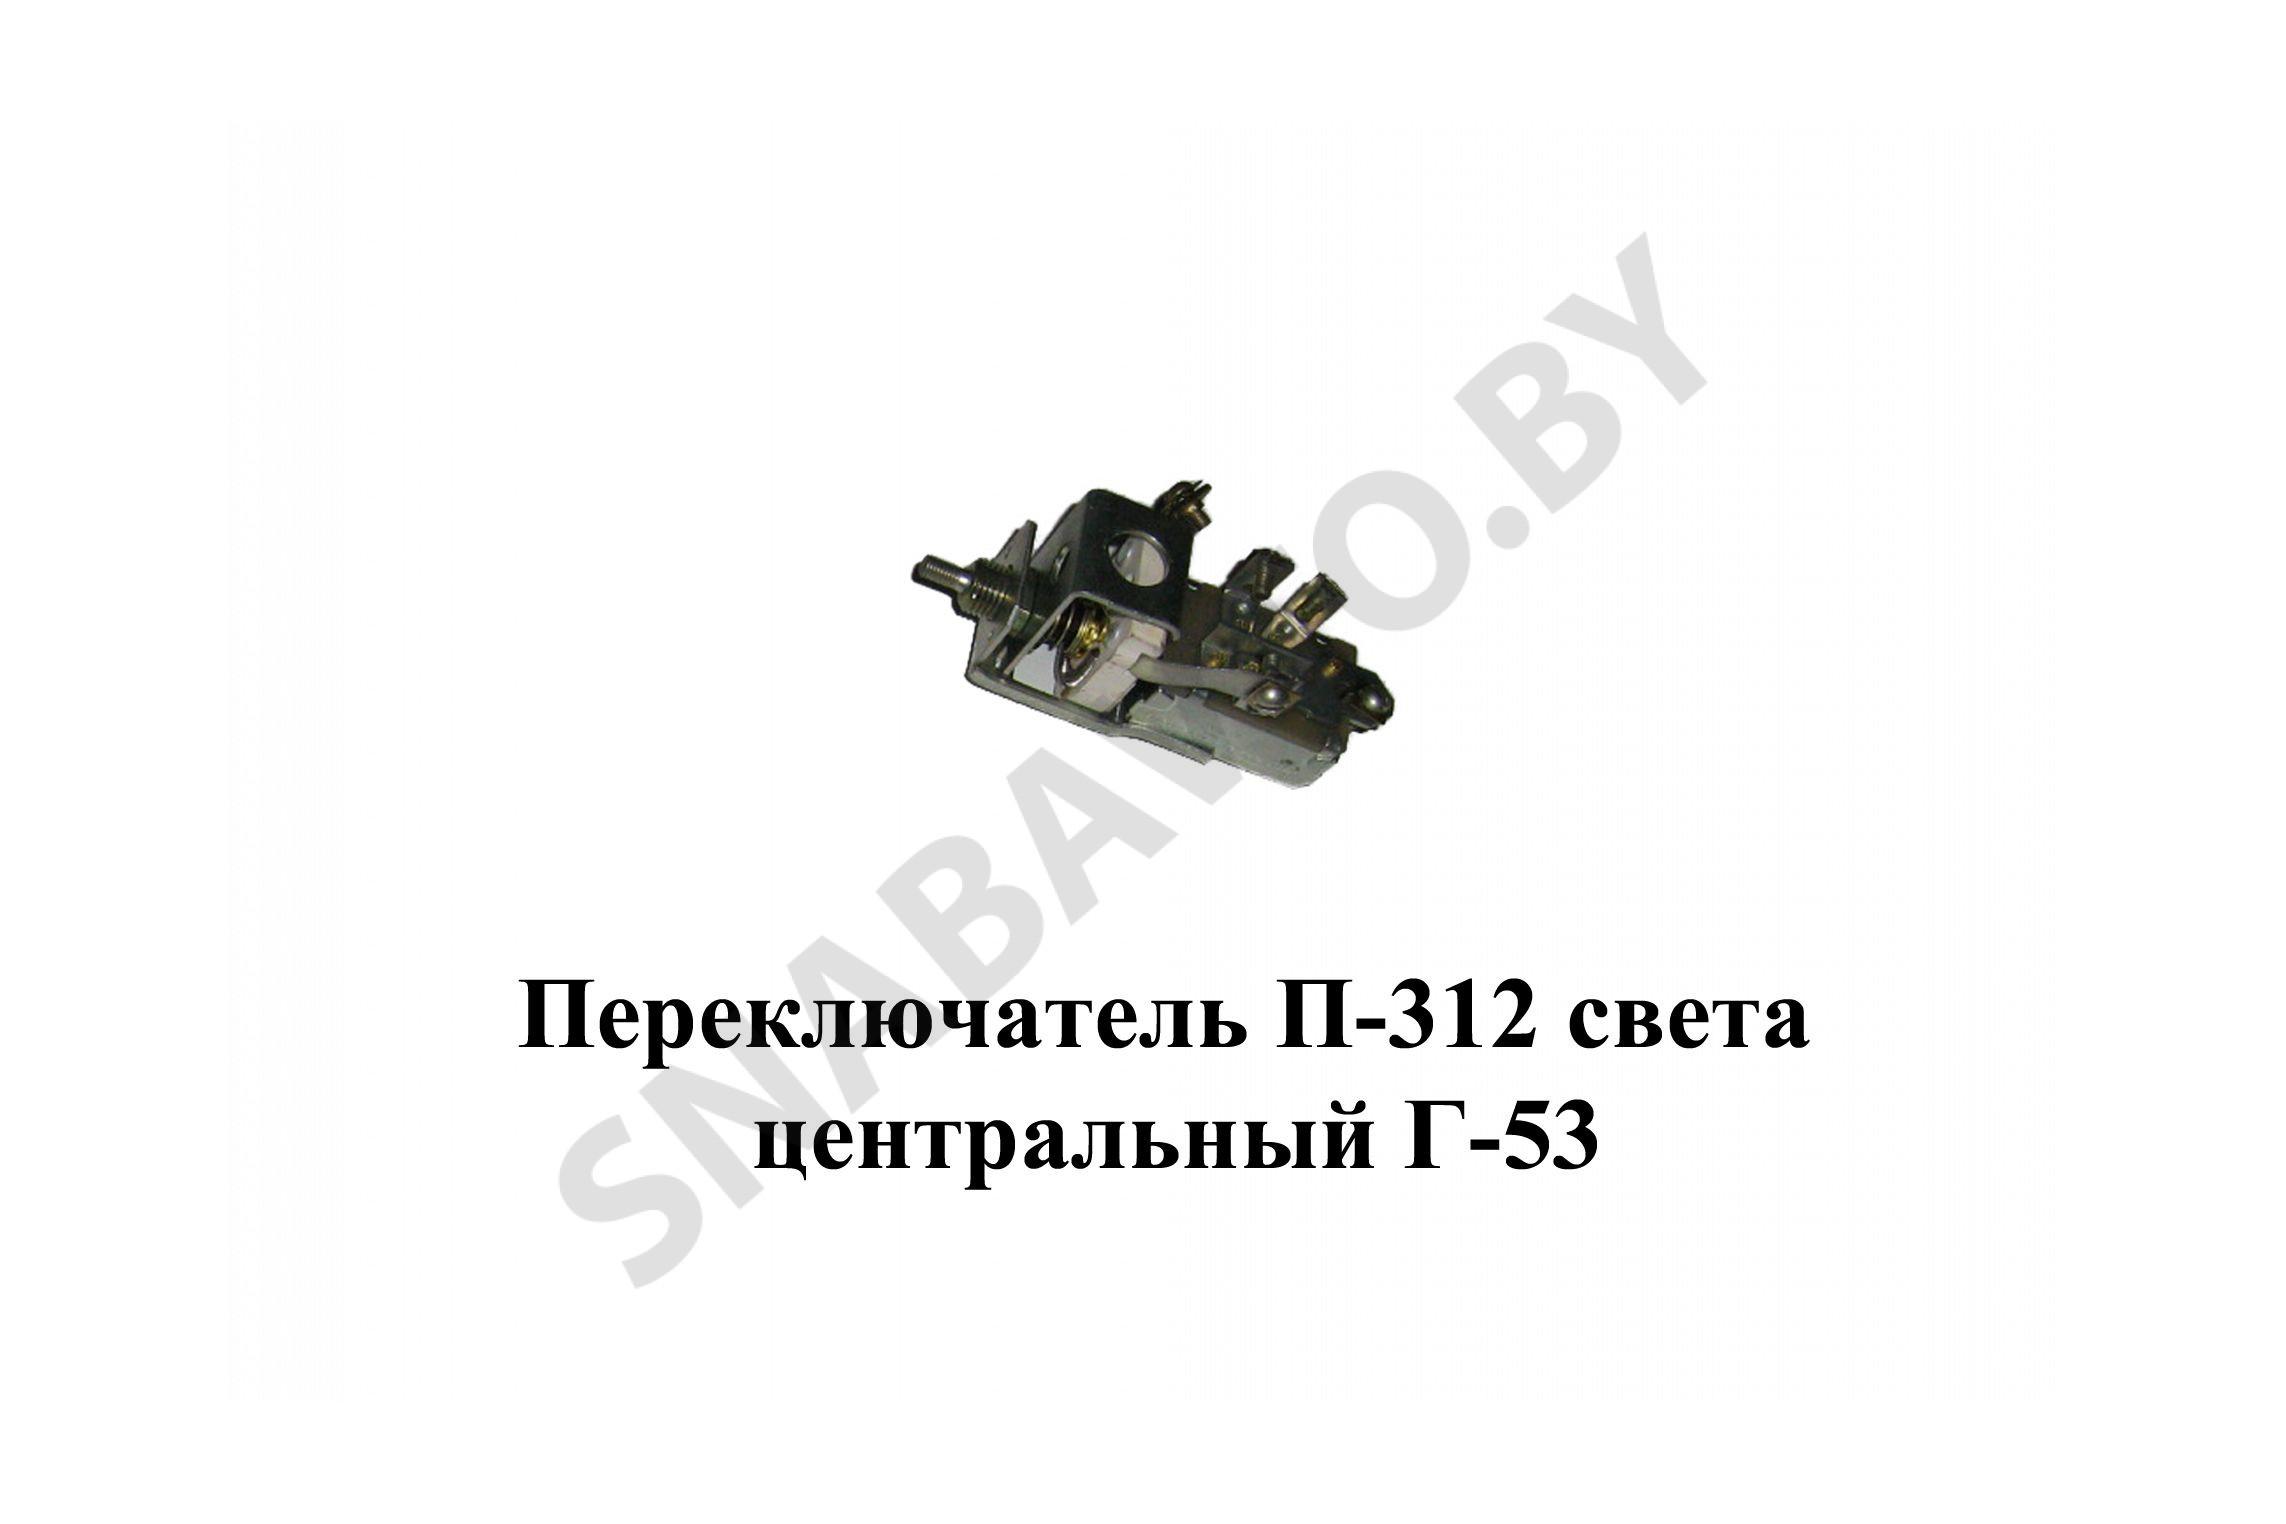 П-312